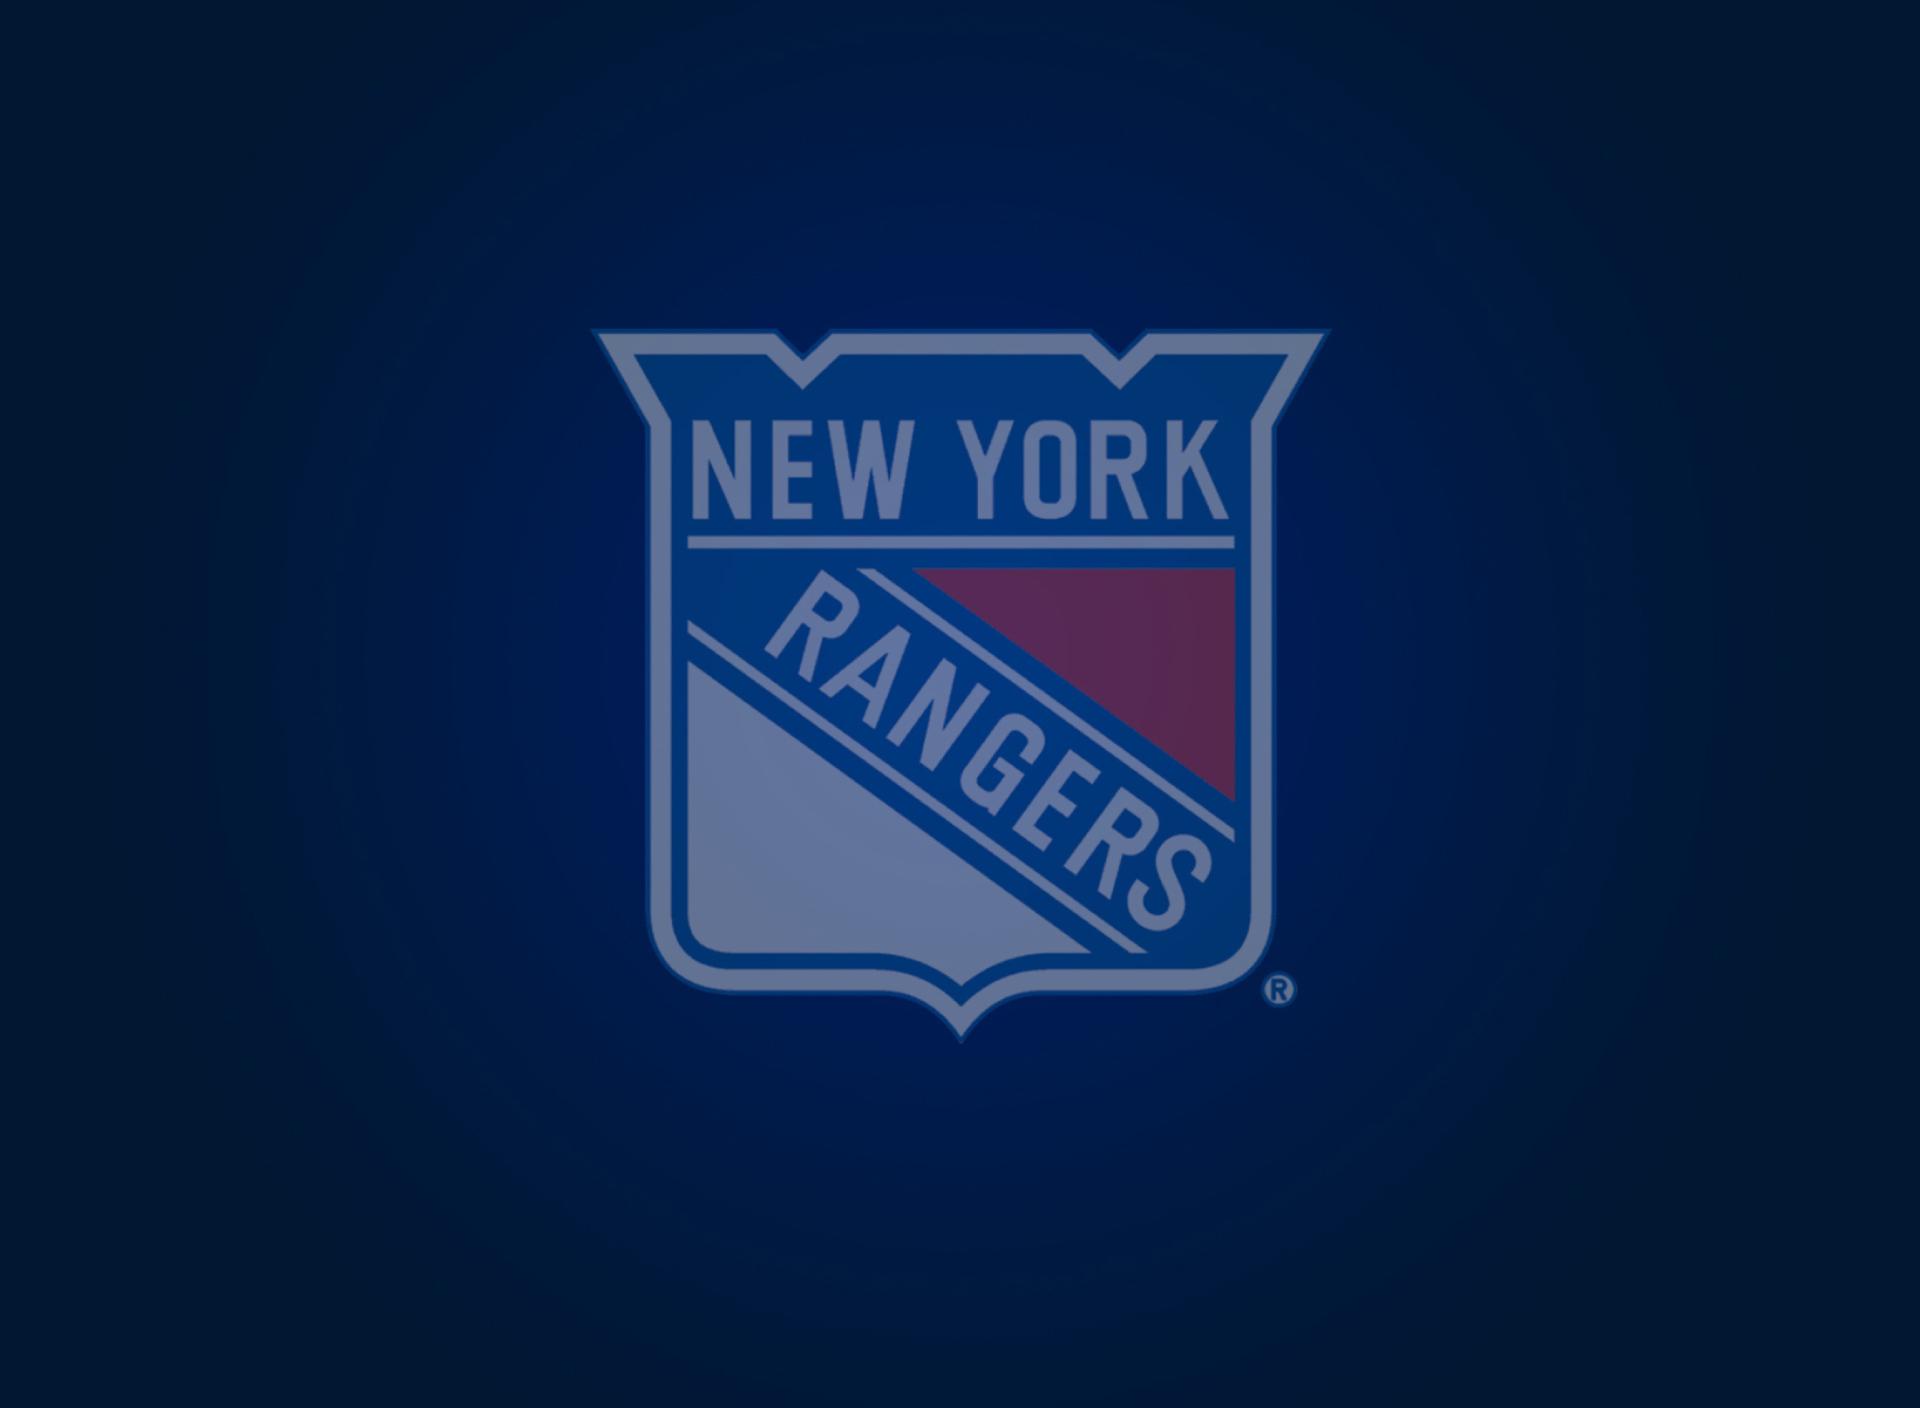 nwe york rangers